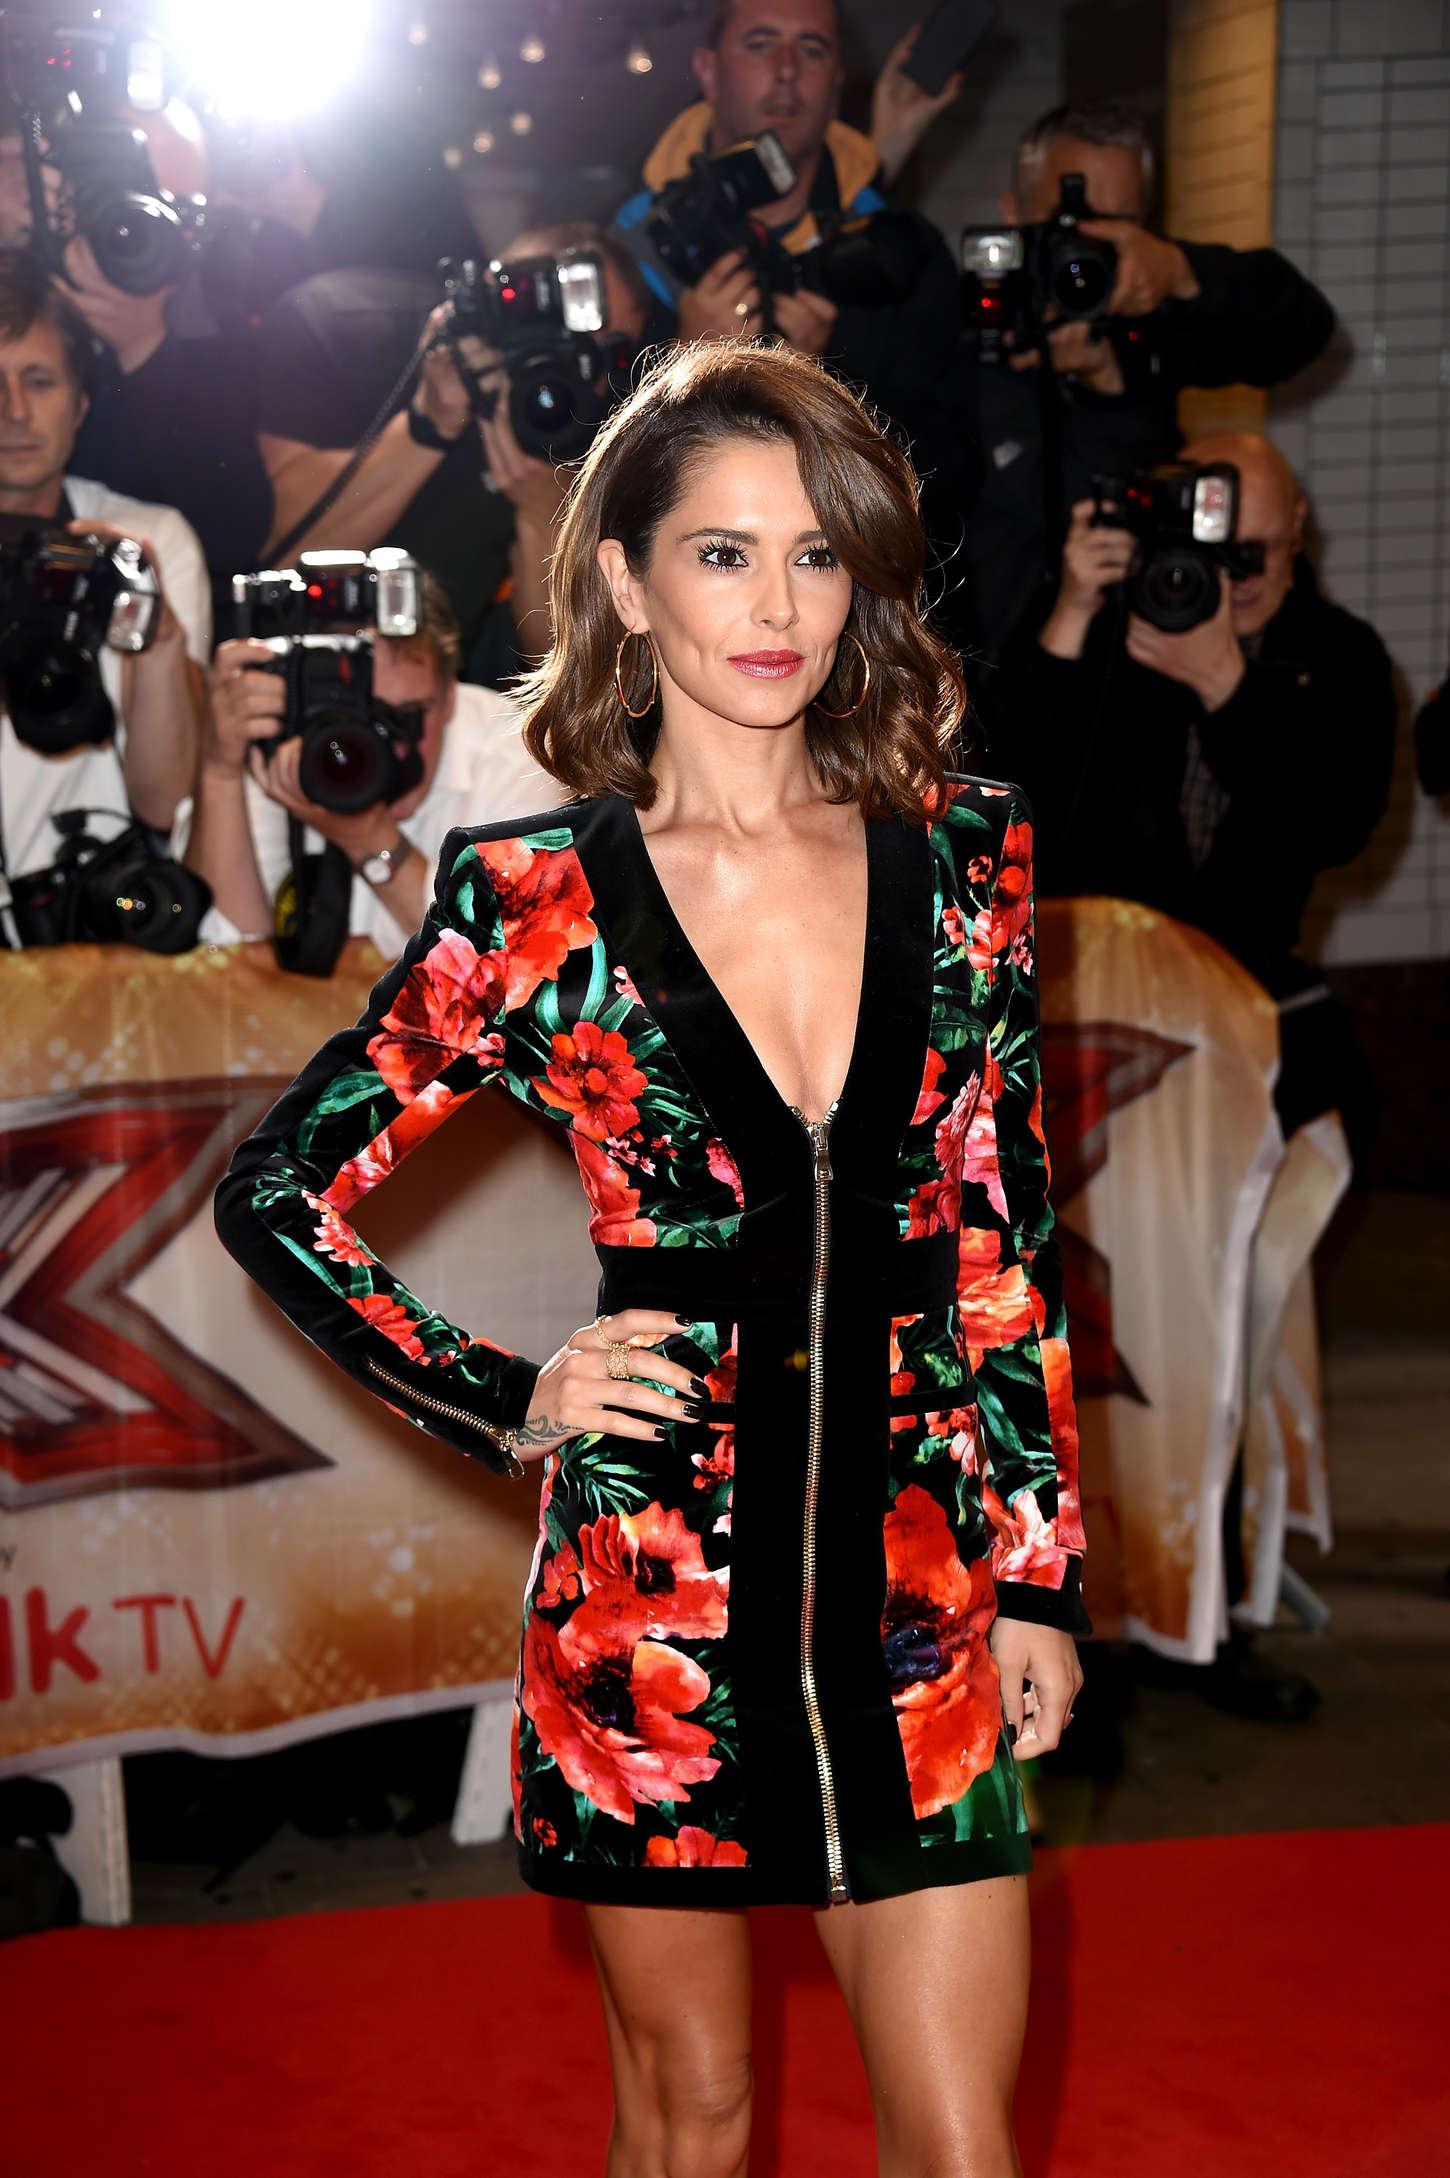 Cheryl Fernandez-Versini The X Factor Press Launch in London